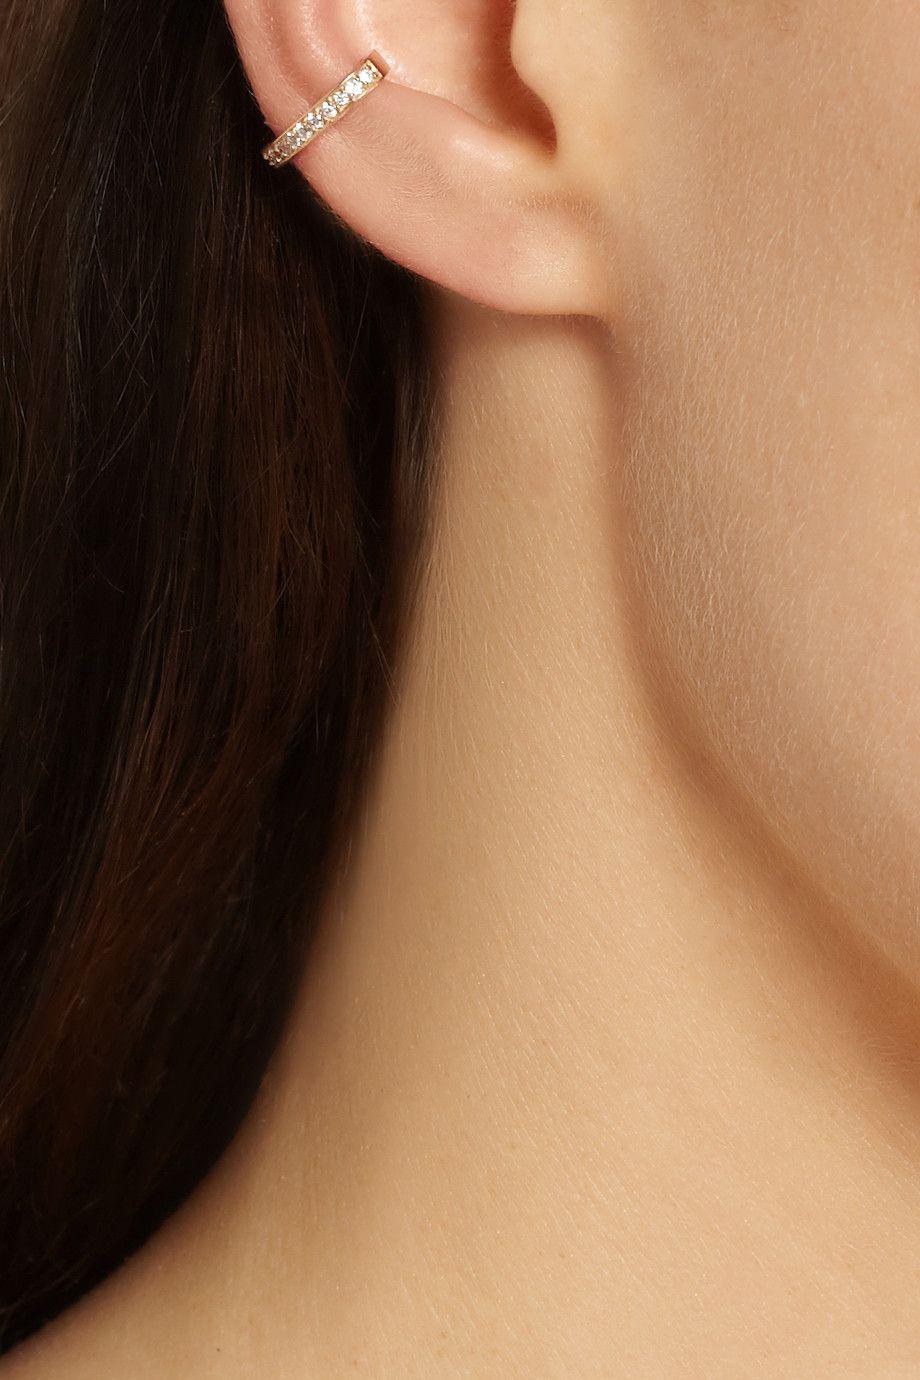 Cute lip piercing ideas  Anita Ko  karat gold diamond ear cuff  My home  Pinterest